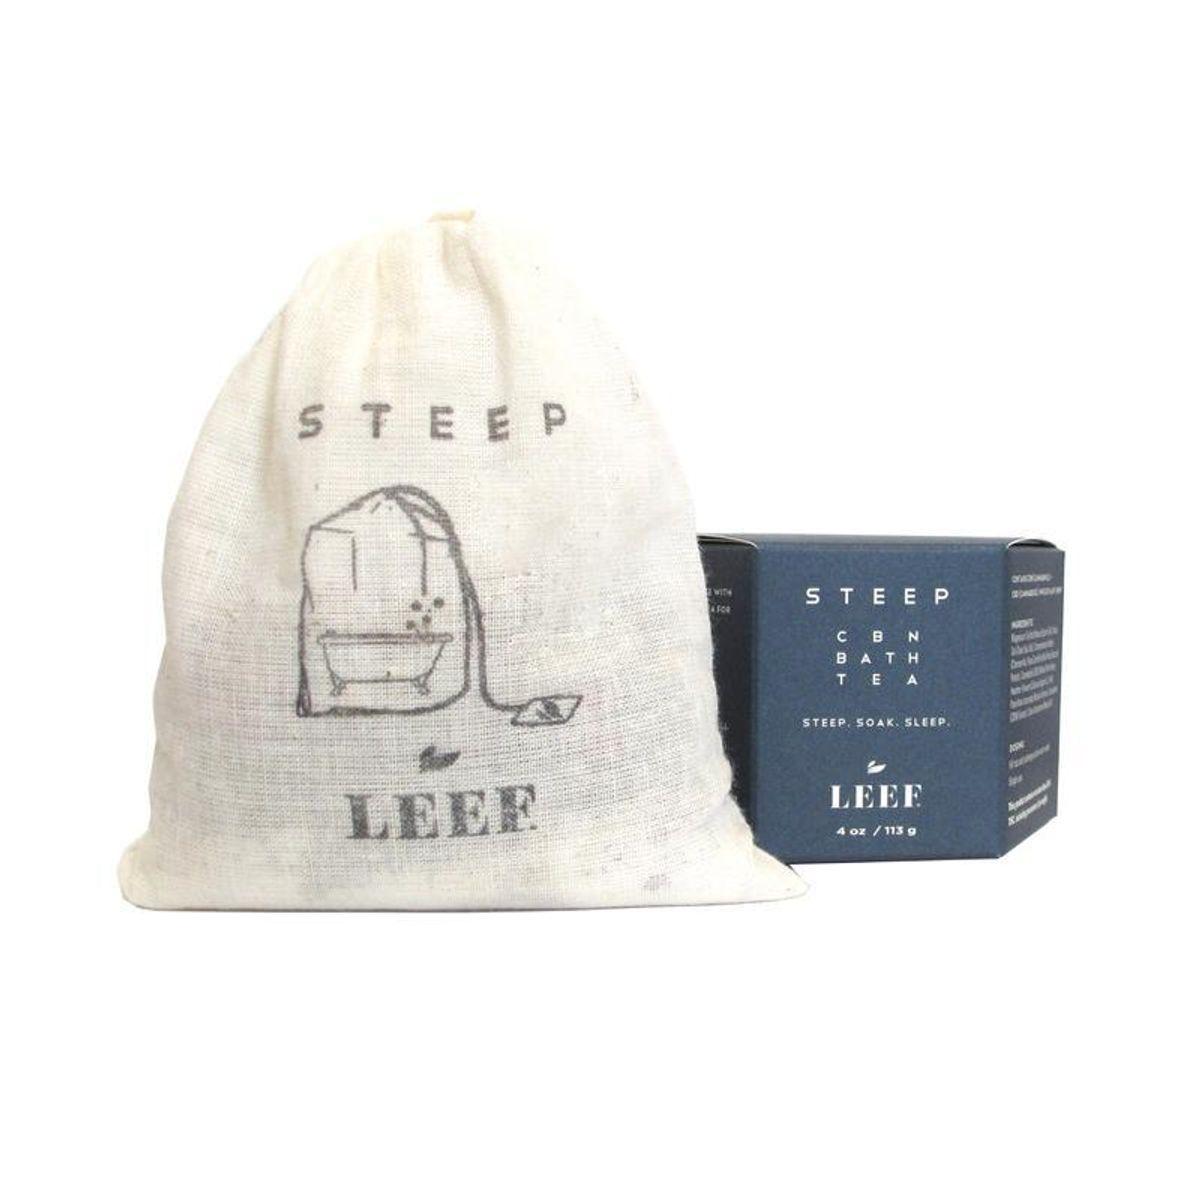 leef steep cbn bath tea